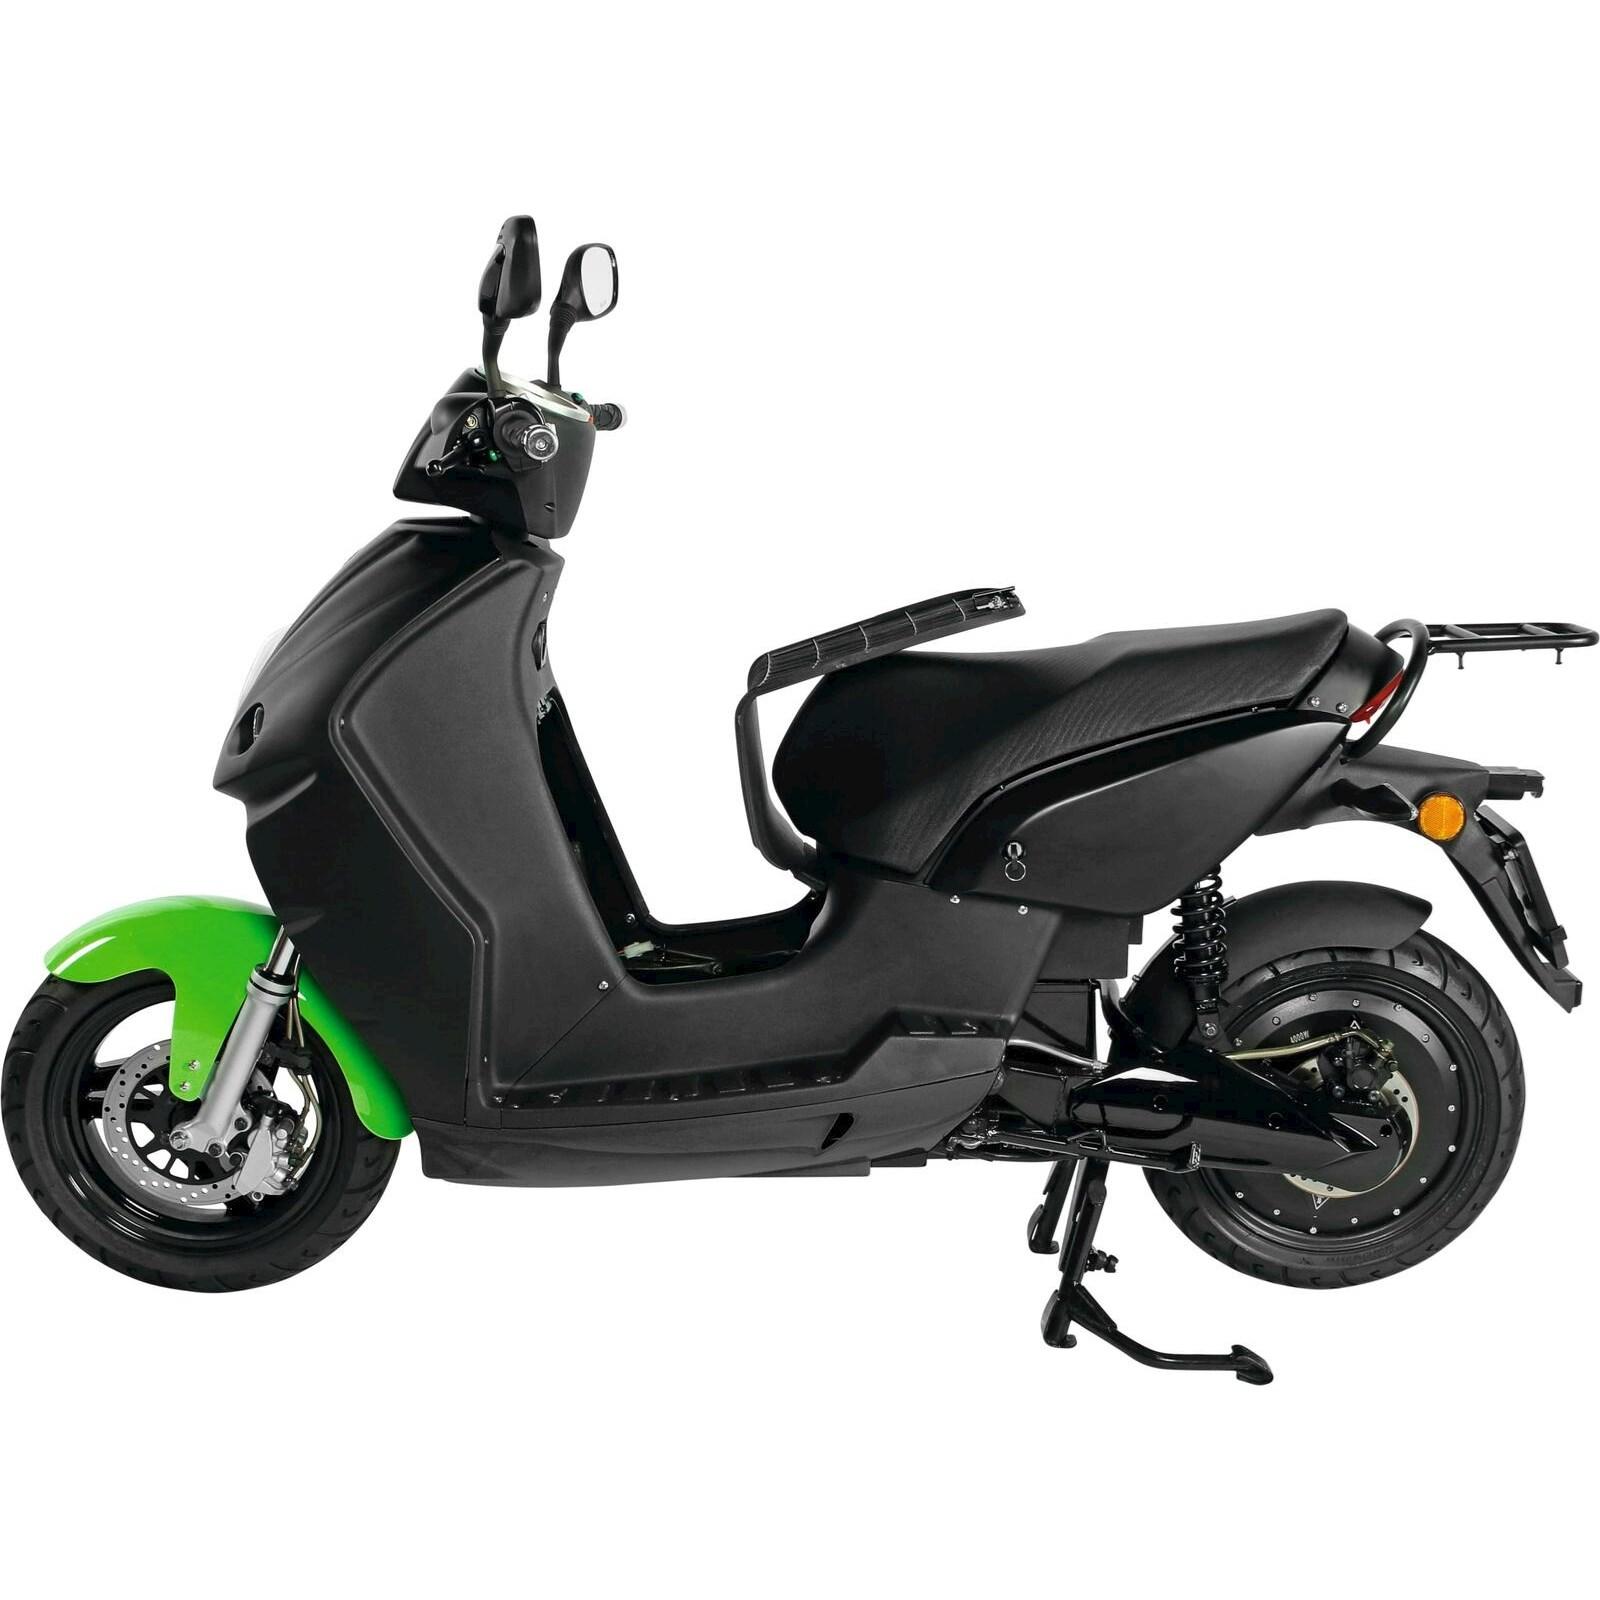 Weihnachtsdeko Bei Roller.E Scooter Vengo V100 L3e Li Lo Scooter Landi